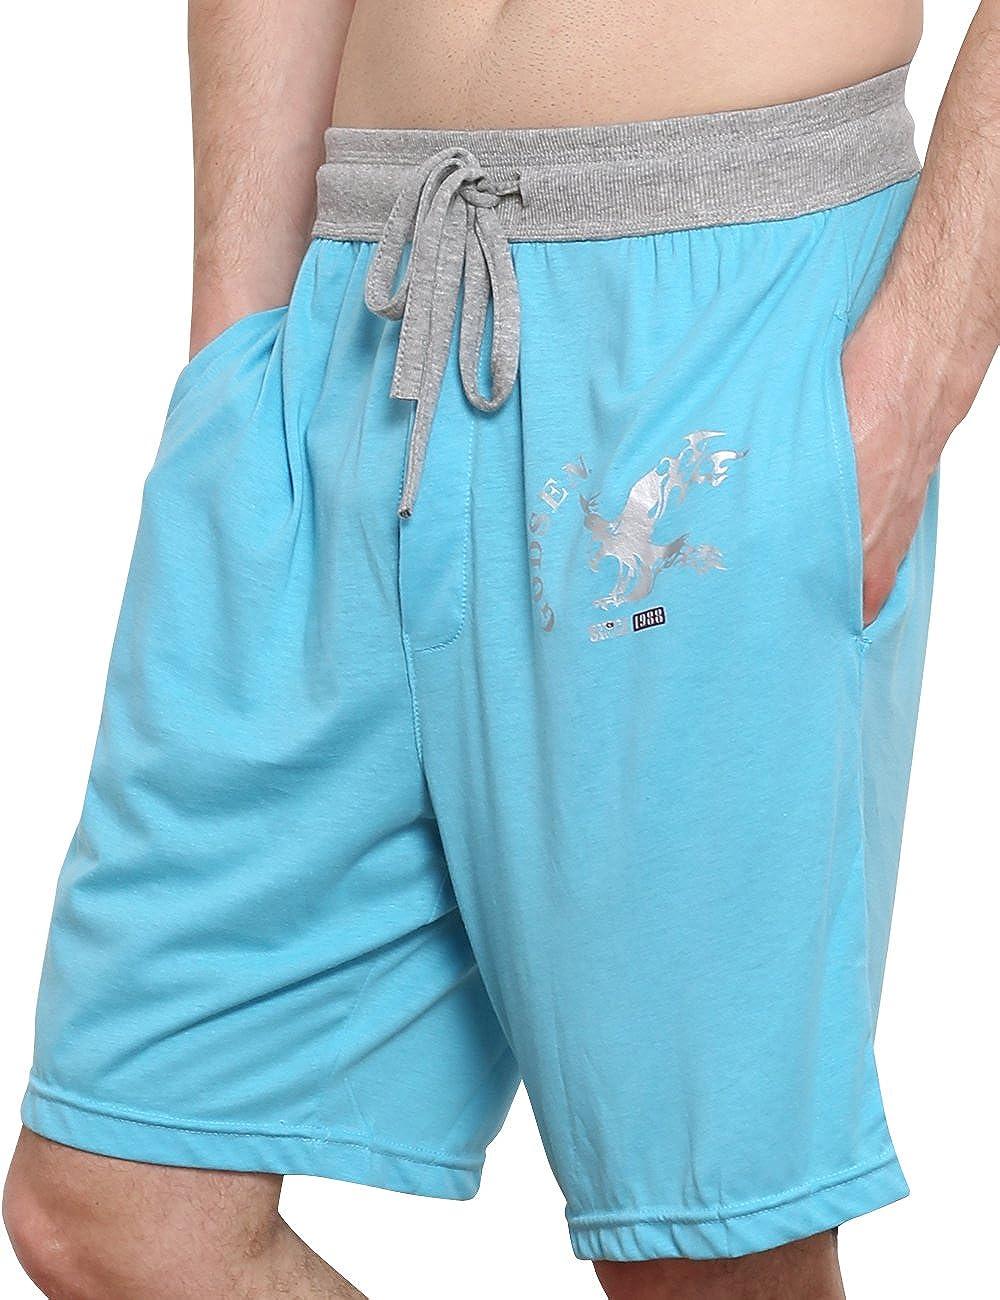 Godsen Mens Cotton Shorts Pajama Shorts Boardshort Sky Blue,S